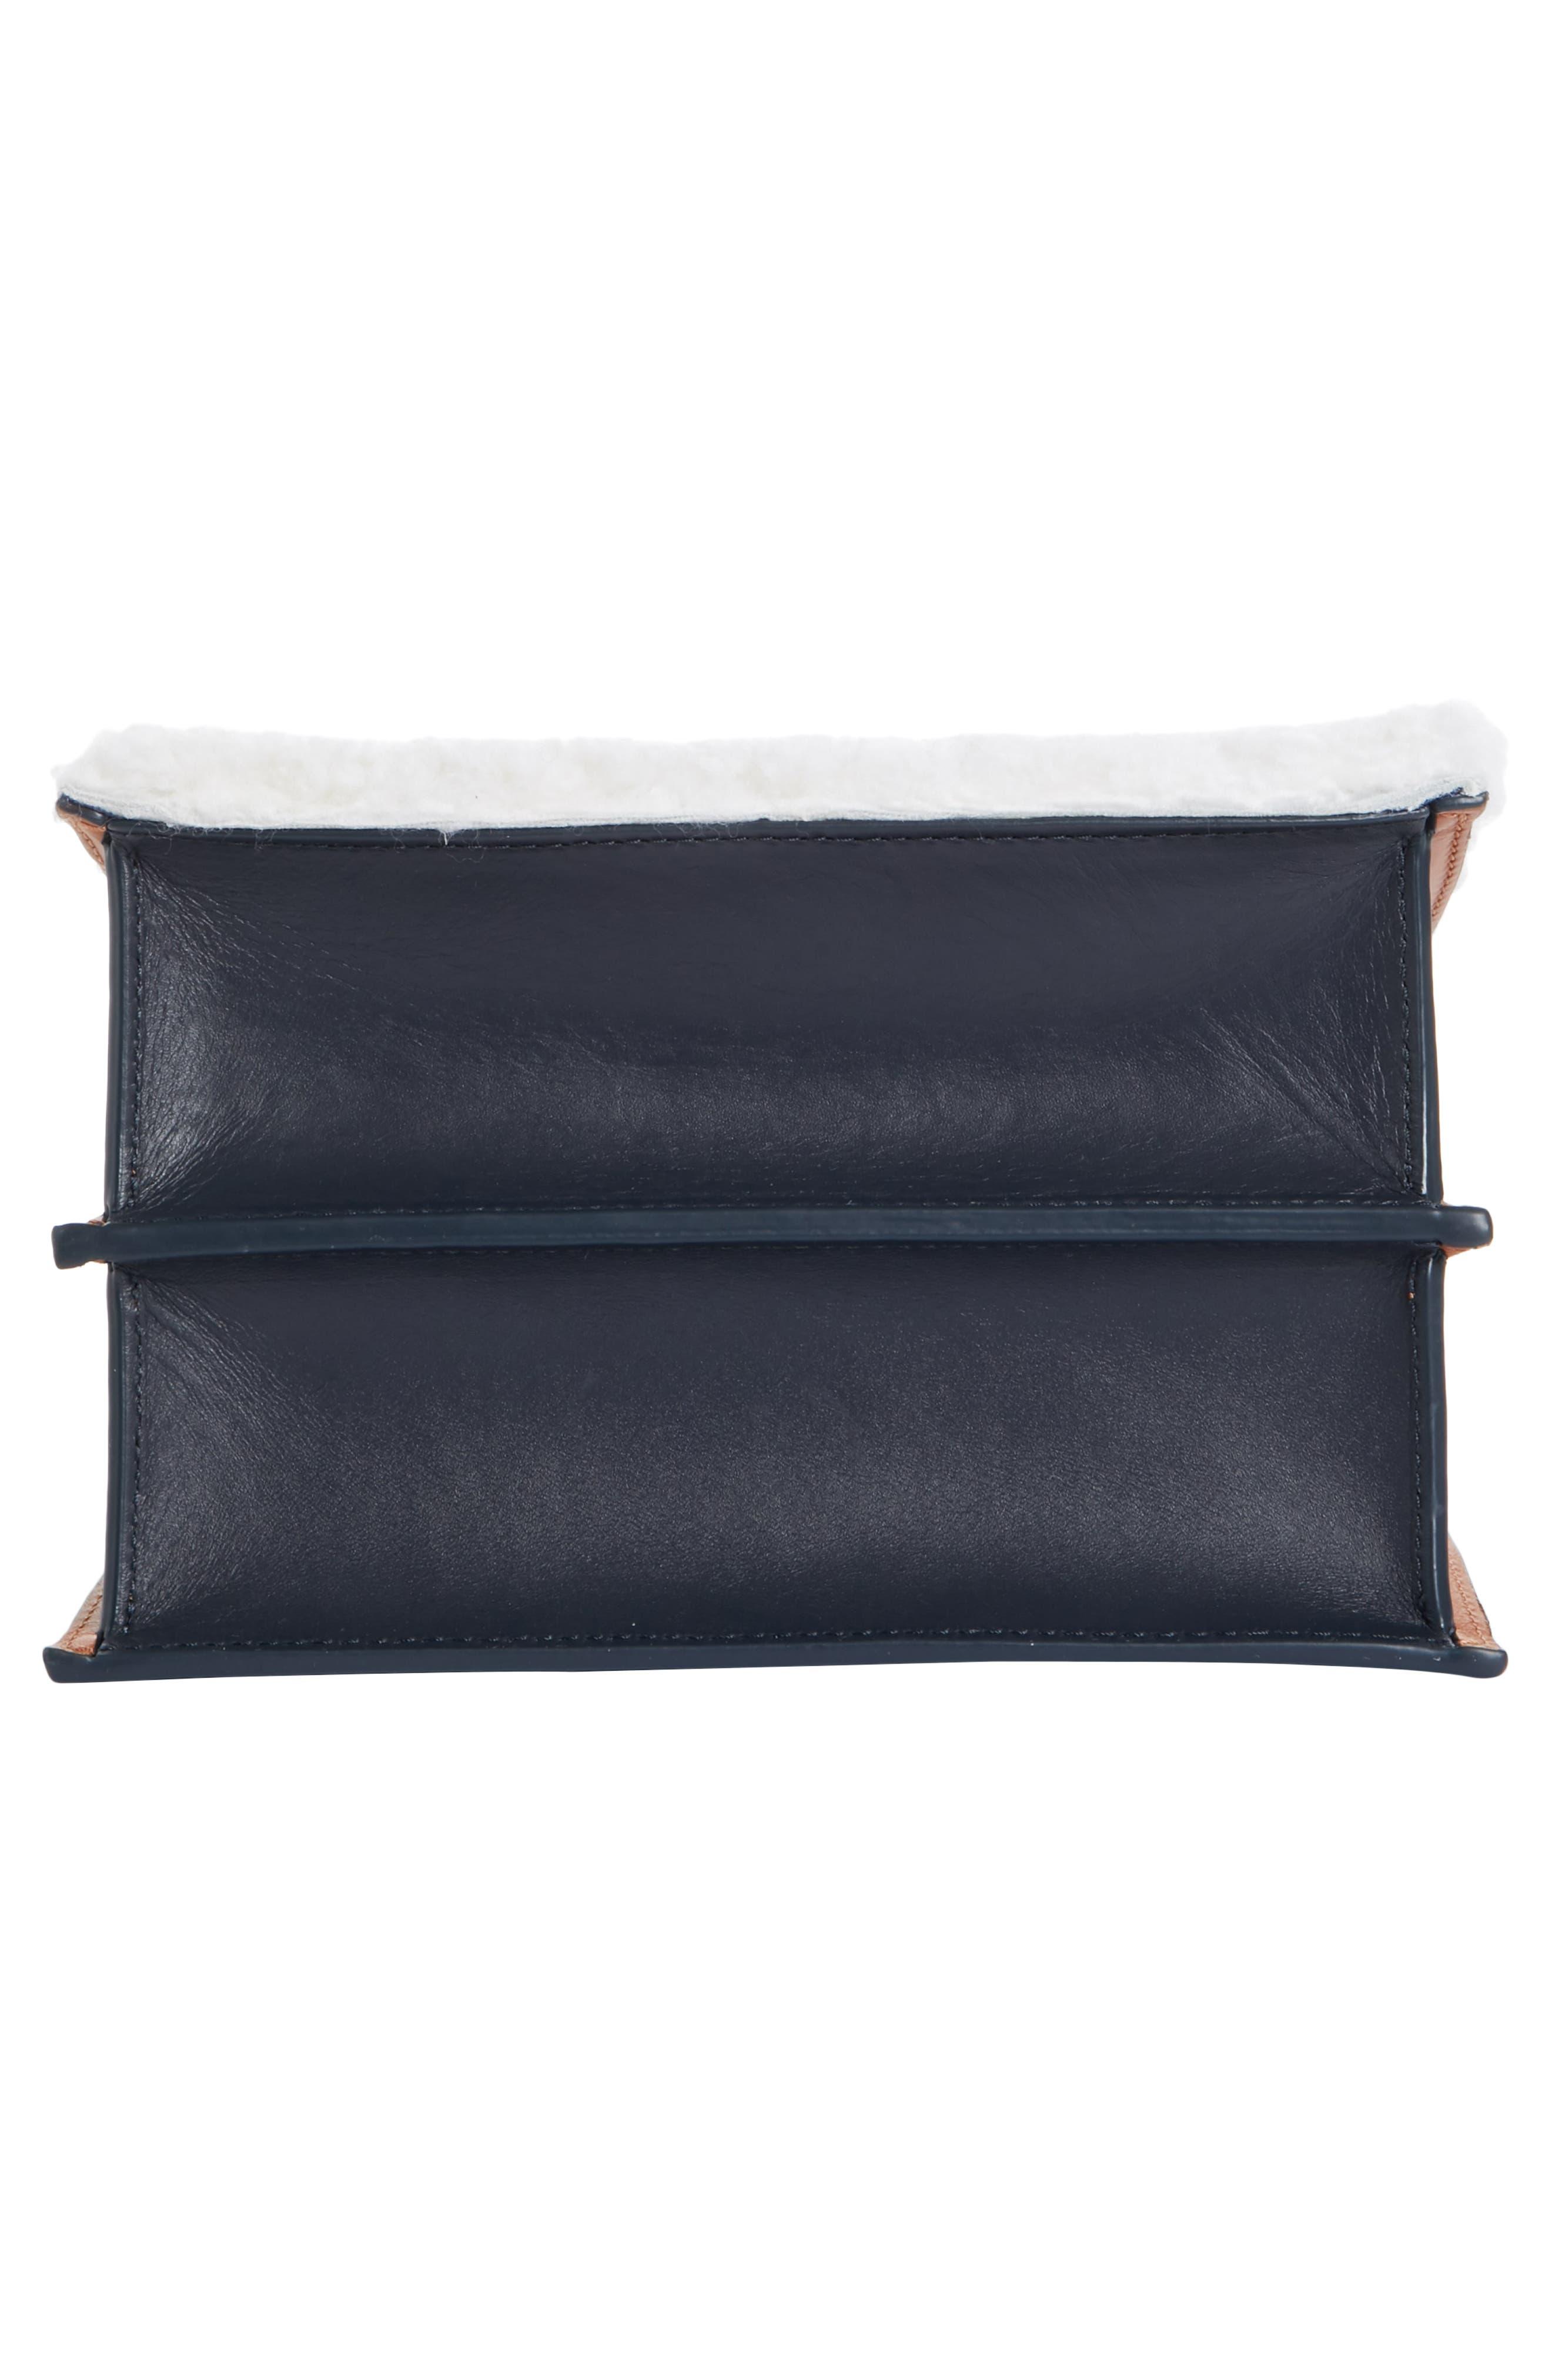 Mini Phoebe Leather Bag,                             Alternate thumbnail 6, color,                             CURLY SHEARLING WHITE-MARINE